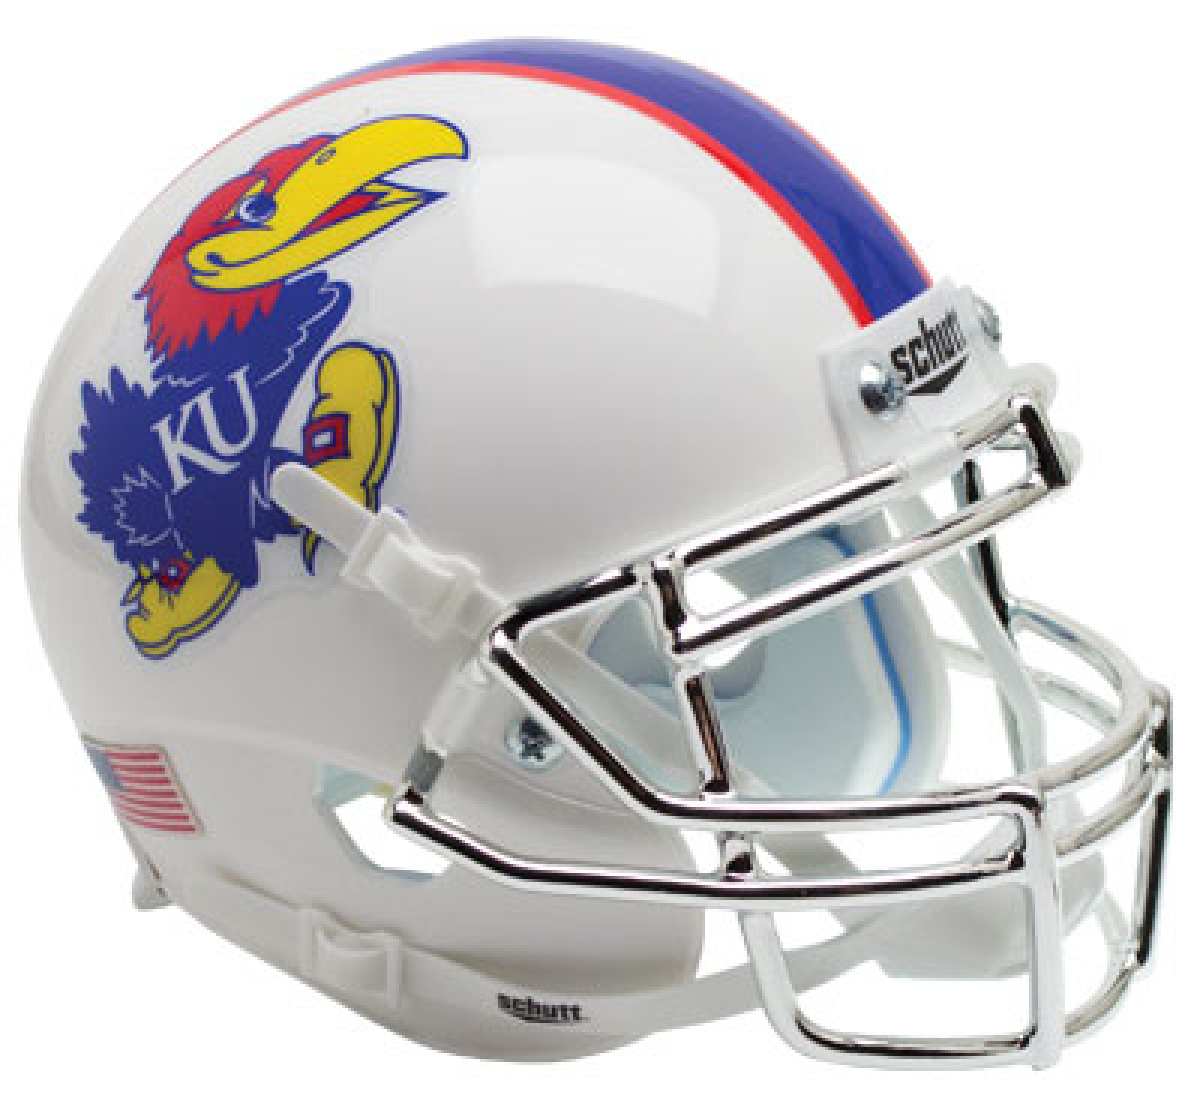 Kansas Jayhawks Full XP Replica Football Helmet Schutt <B>White with Chrome Mask</B>